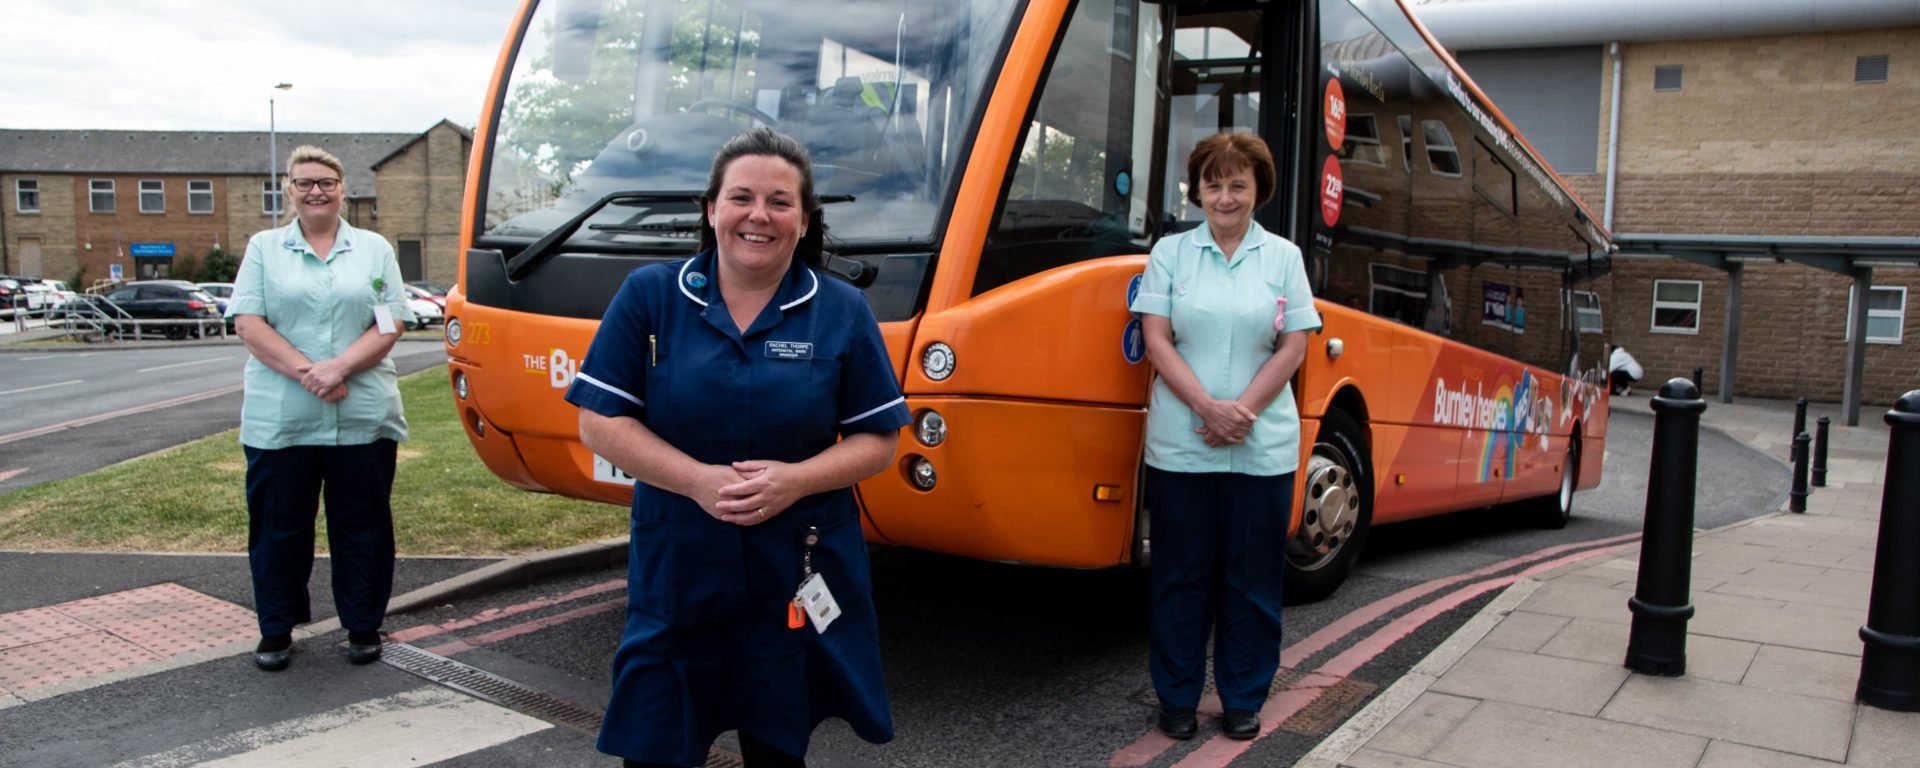 pic-3-burnley-heroes-bus-launch